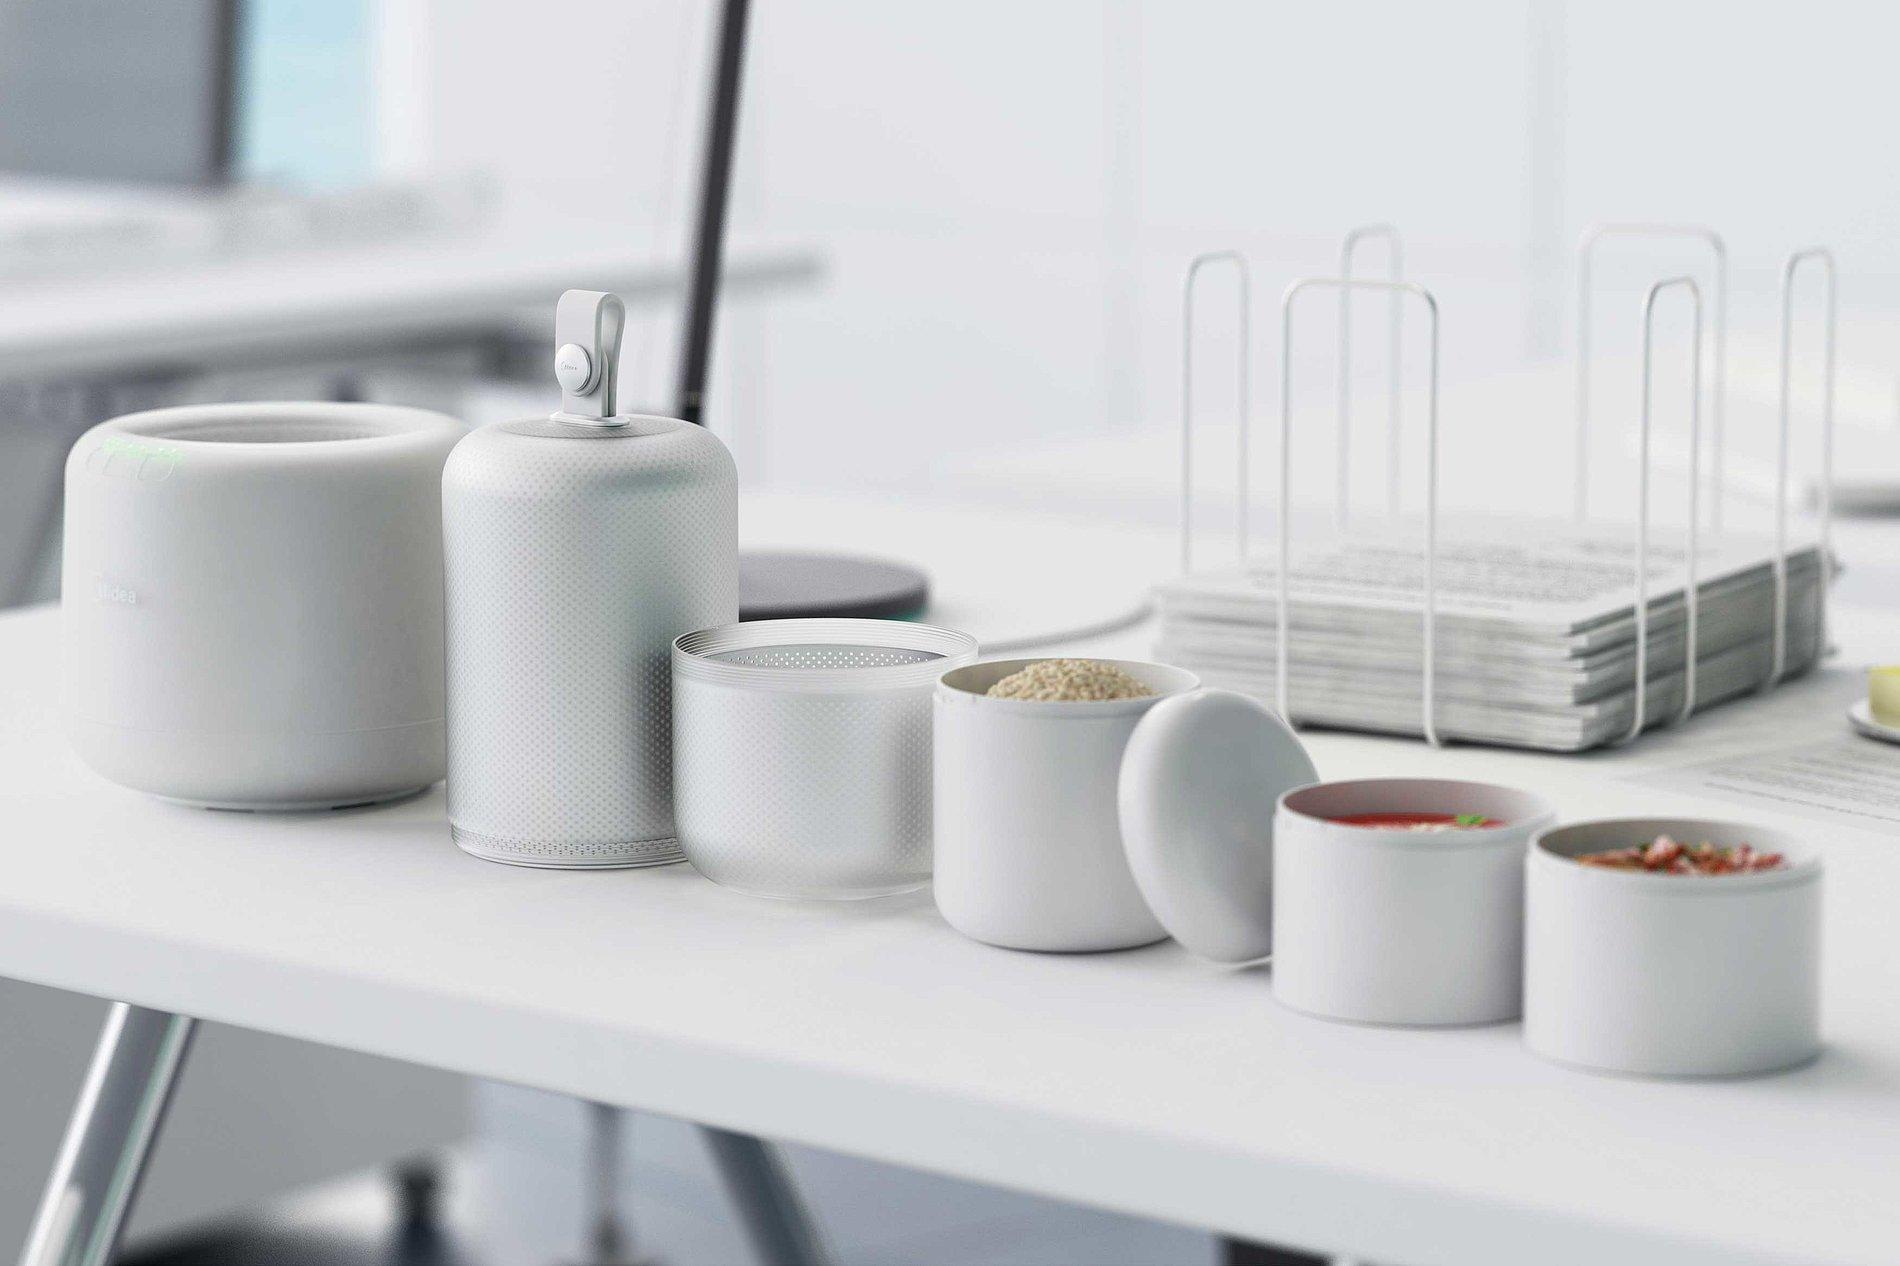 BENTO – Mini Counter-Top MWO | Red Dot Design Award